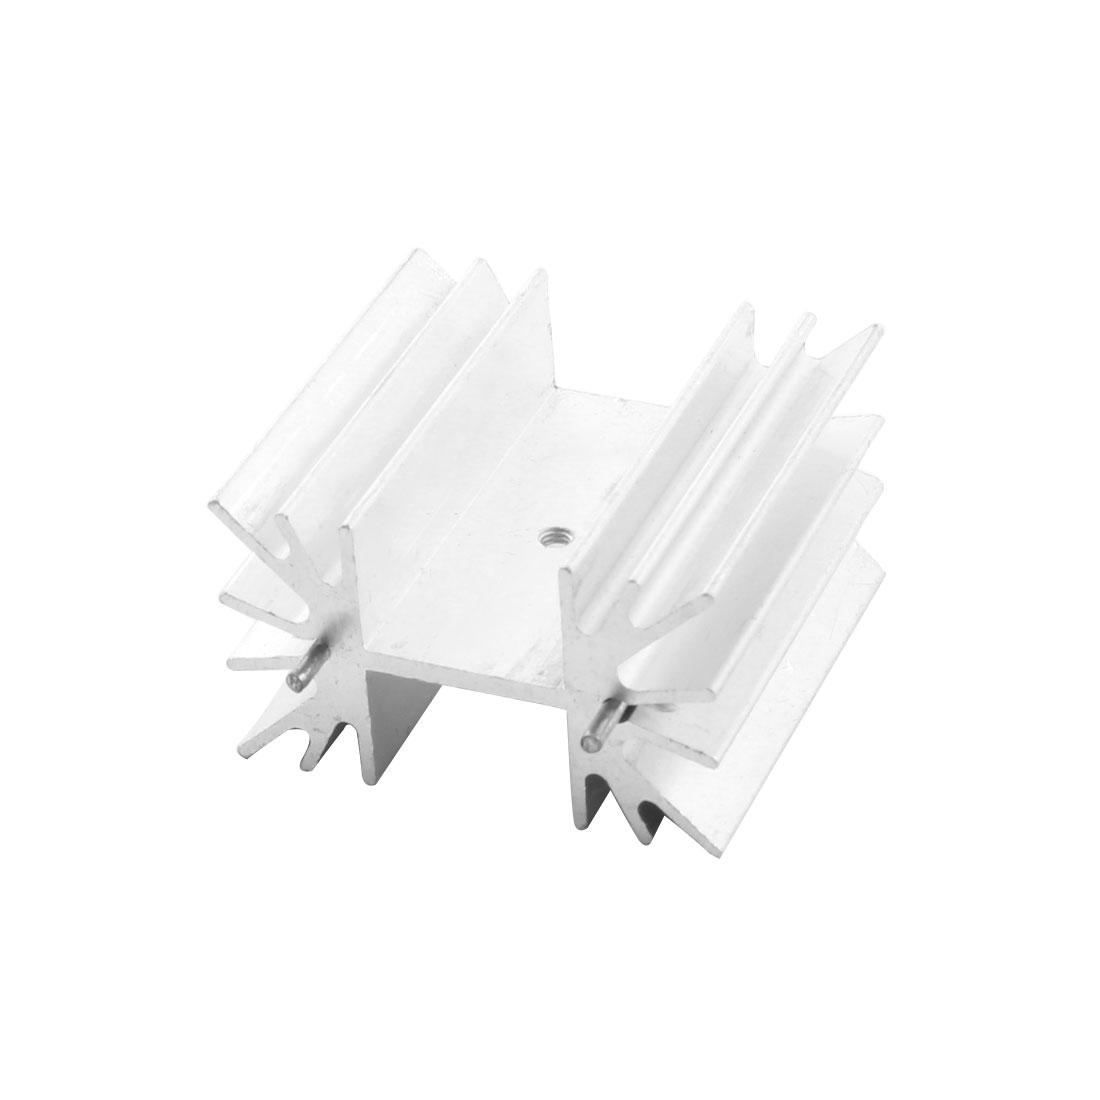 PCB Board Silver Tone Aluminium Heatsink Heat Diffuse Cooler 42mm x 40mm x 25mm w Dual Needle